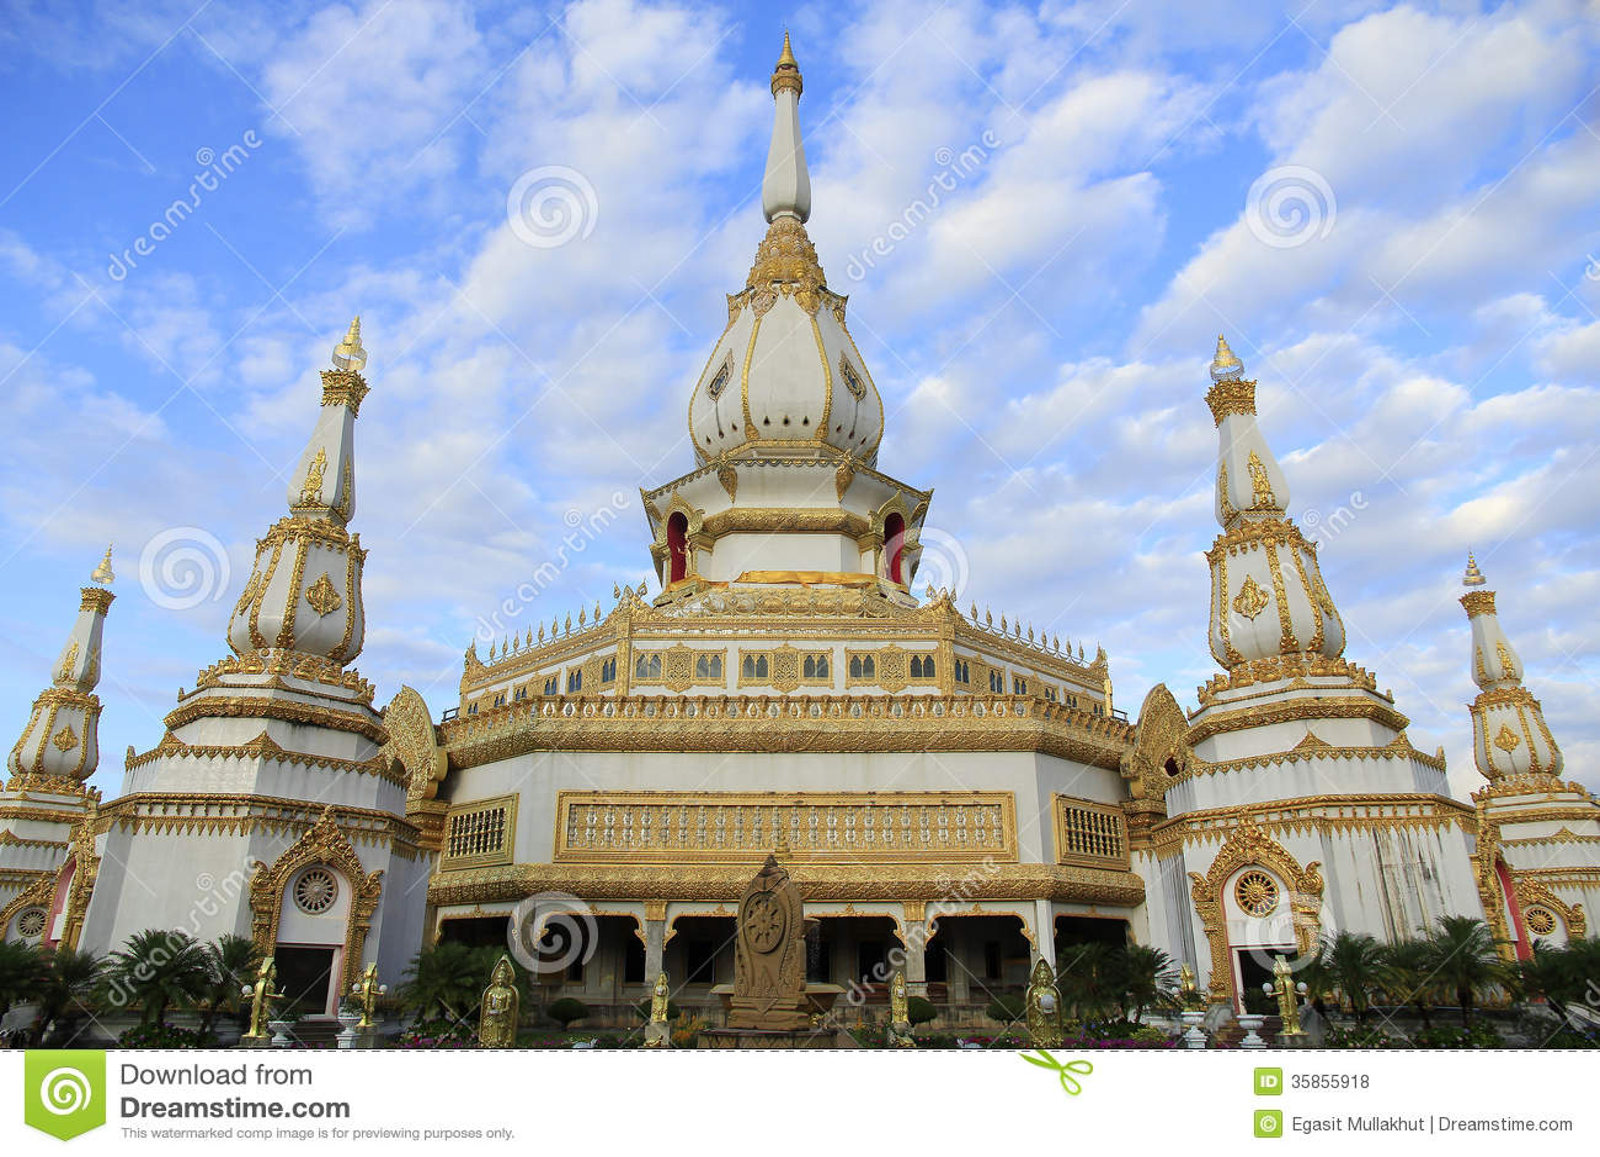 Roi Et Thailand  City pictures : Phra Maha Chedi Chai Mongkol at Roi Et Province, Thailand.